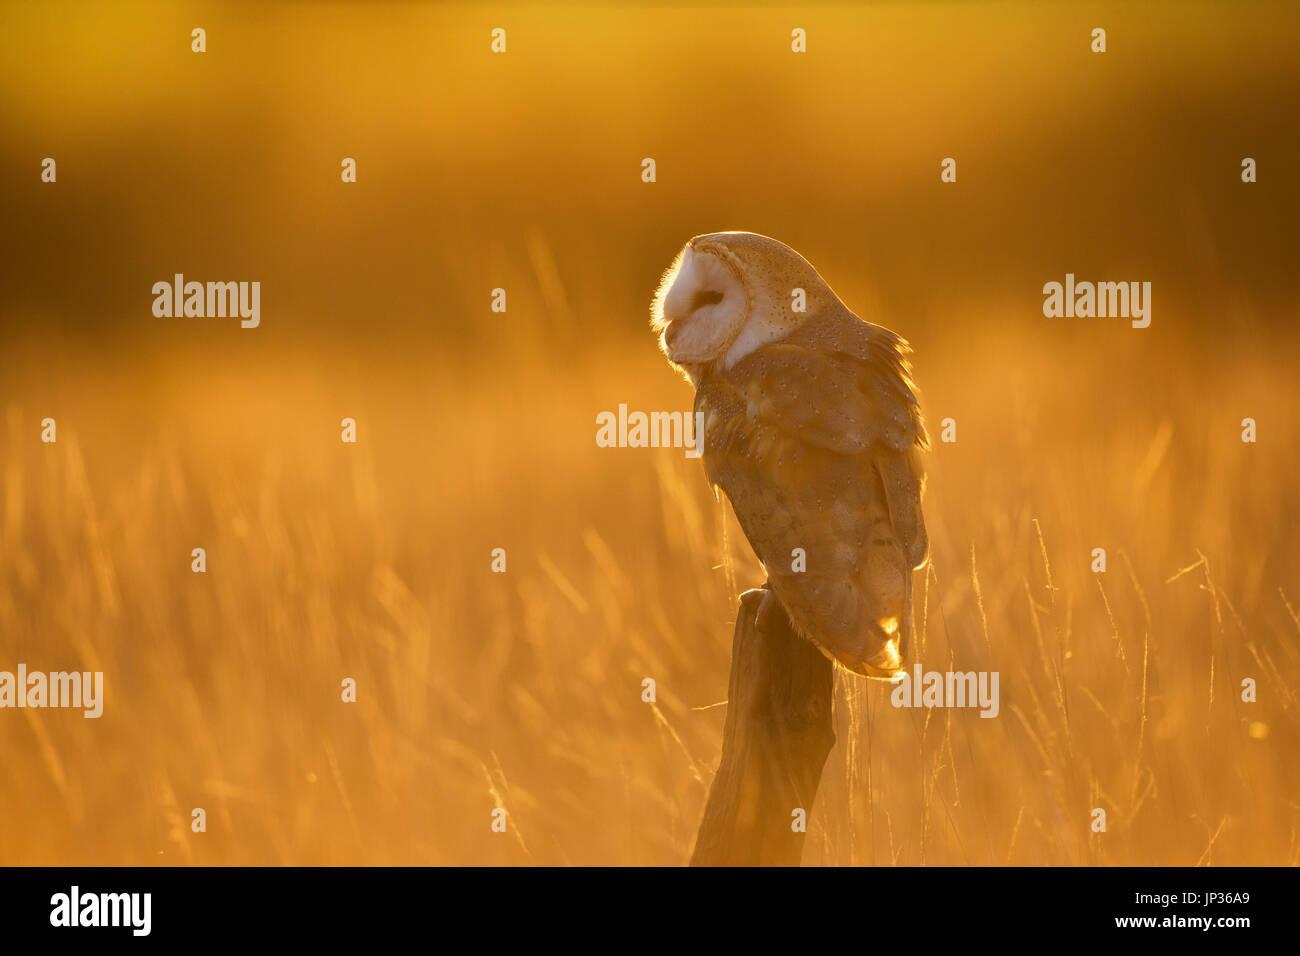 Schleiereule (Tyto Alba) thront in goldenes Licht bei Sonnenuntergang Stockbild